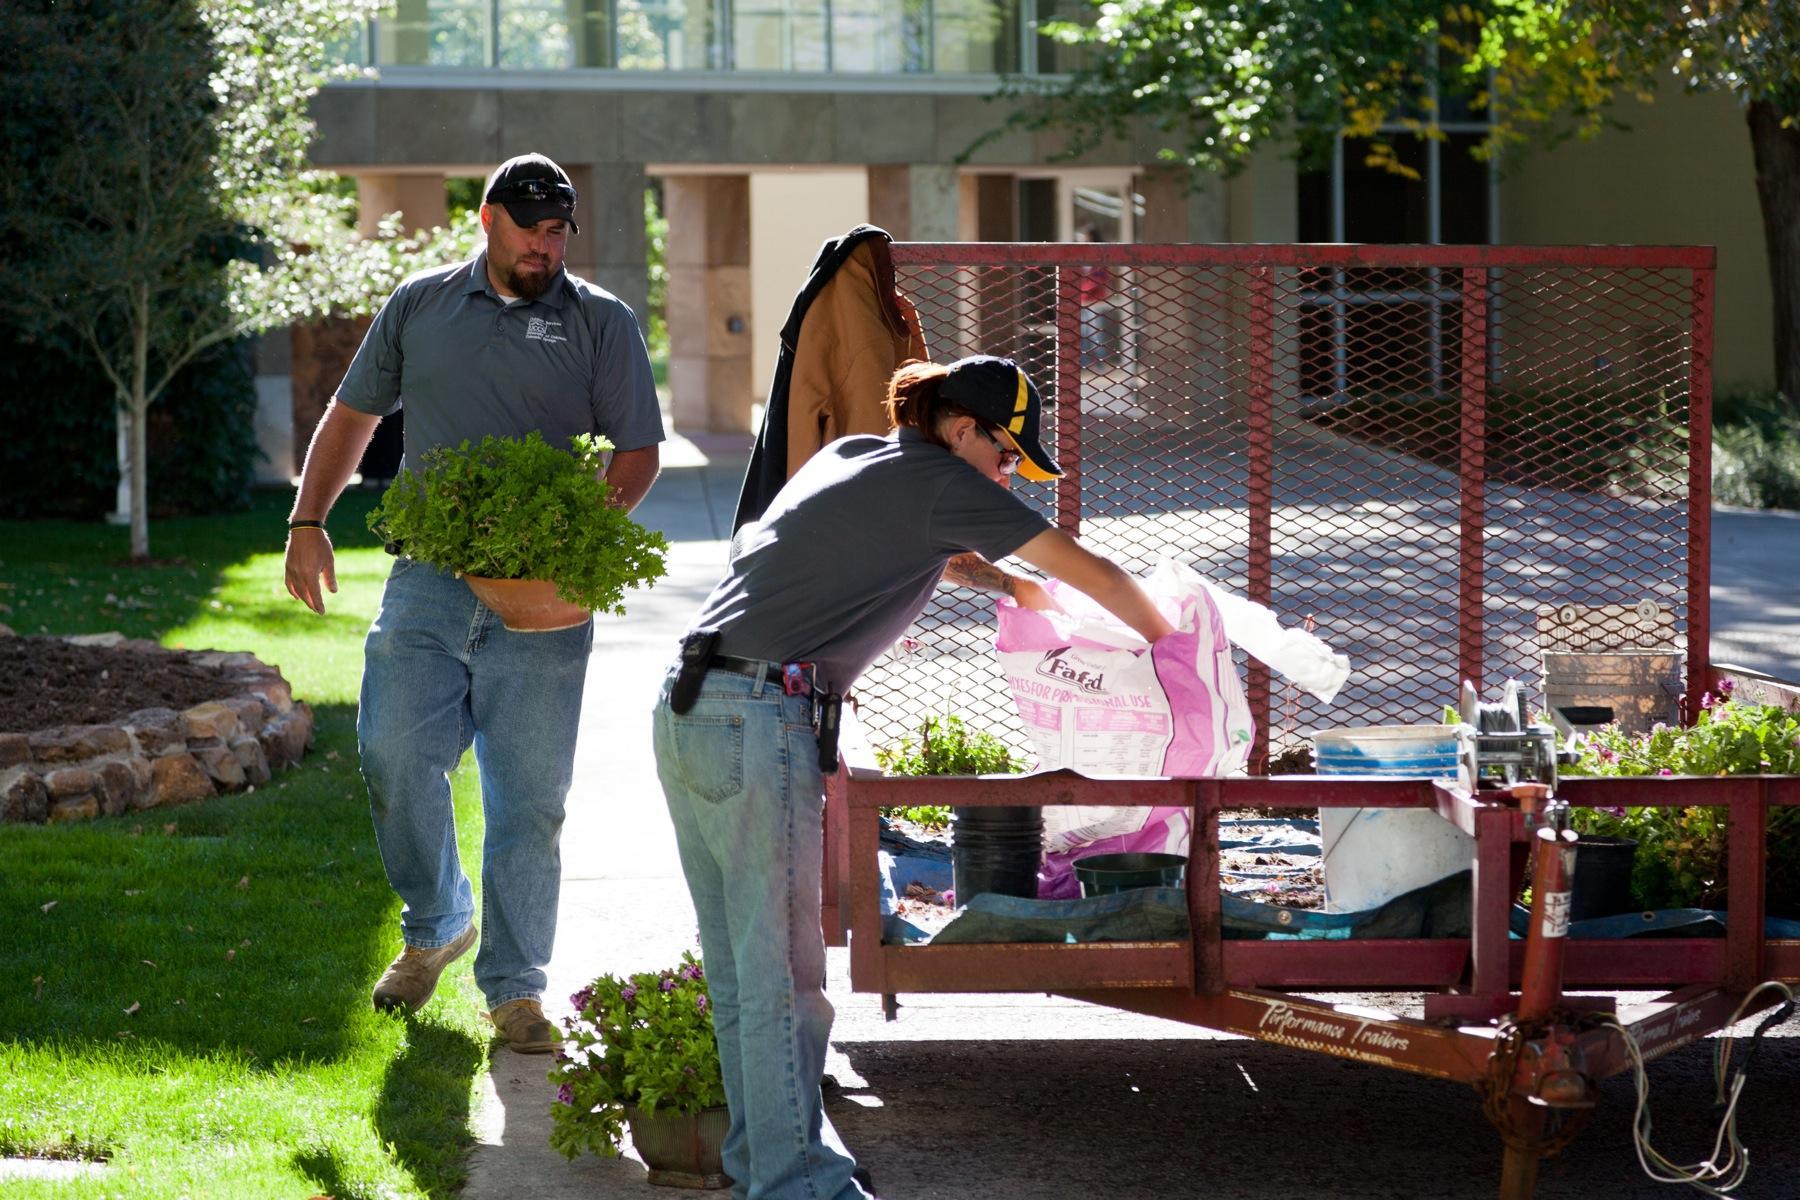 Facilities Services help pot geraniums